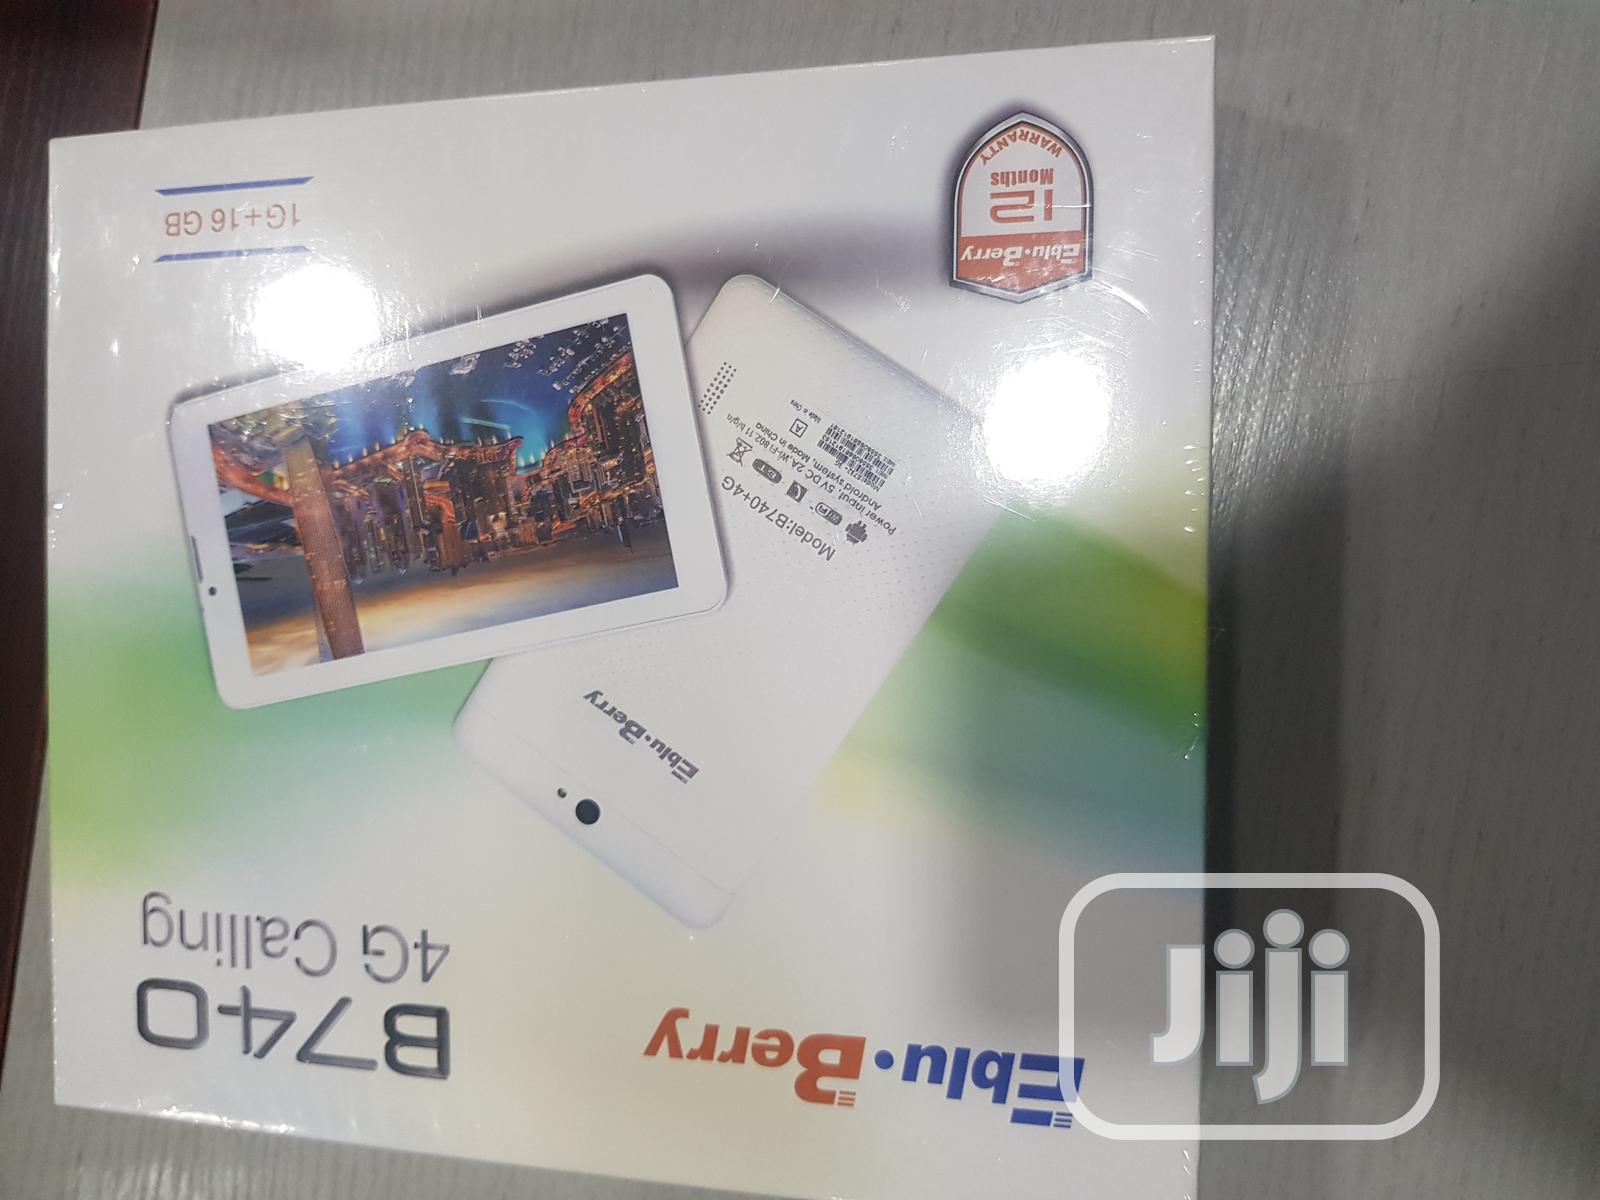 New Tablet 16 GB | Tablets for sale in Enugu / Enugu, Enugu State, Nigeria